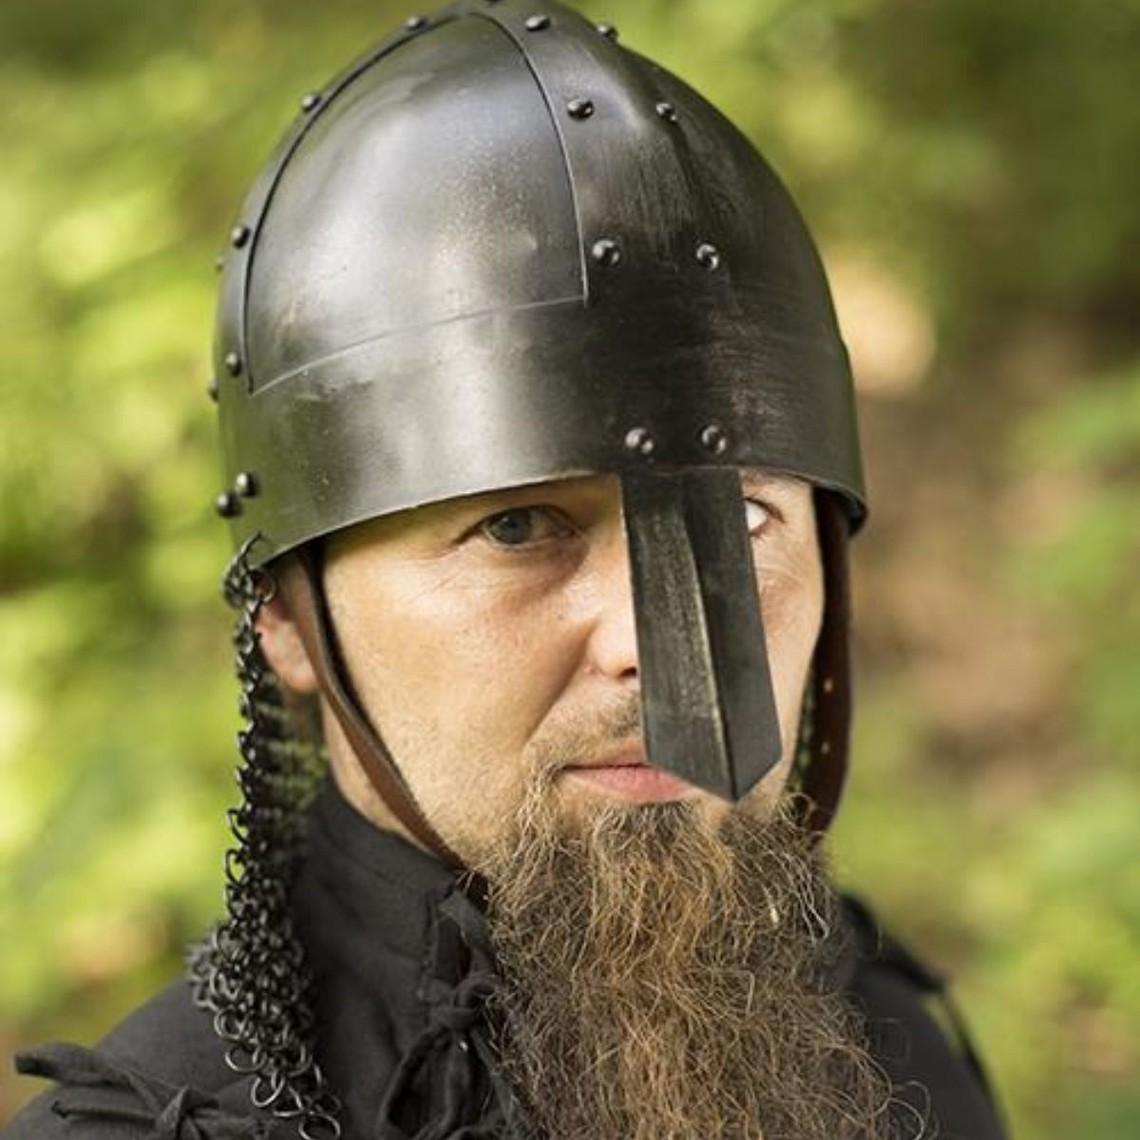 Epic Armoury Viking spangenhelm con cota de malla, oscuro